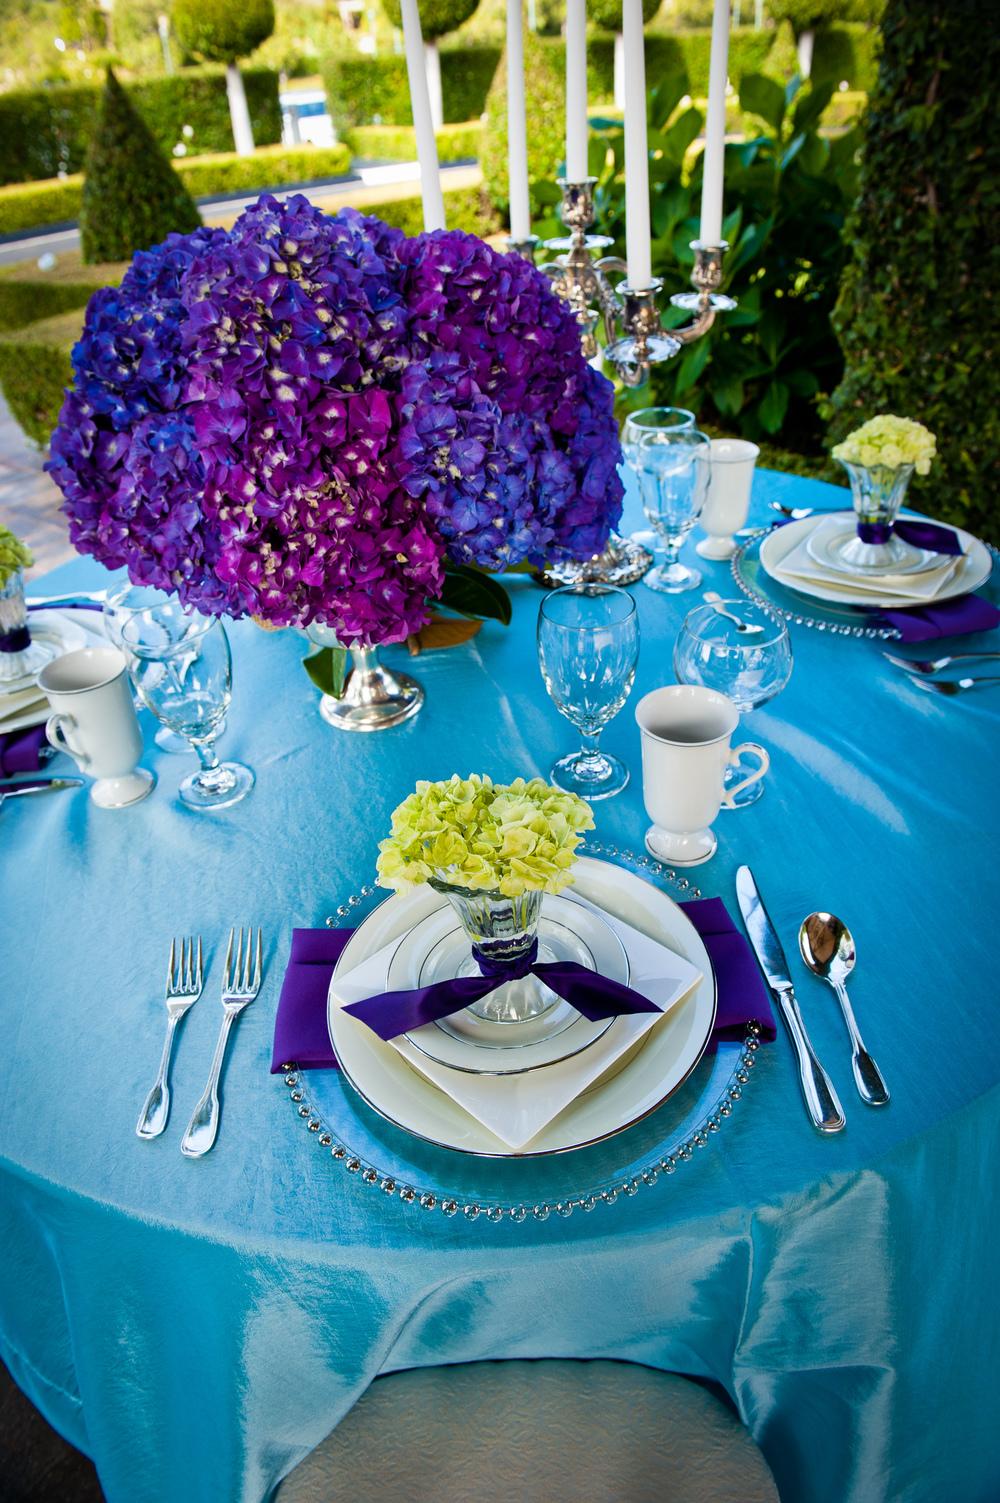 stewart_bertrand_wedding_photography_sdsw13-1006.jpg